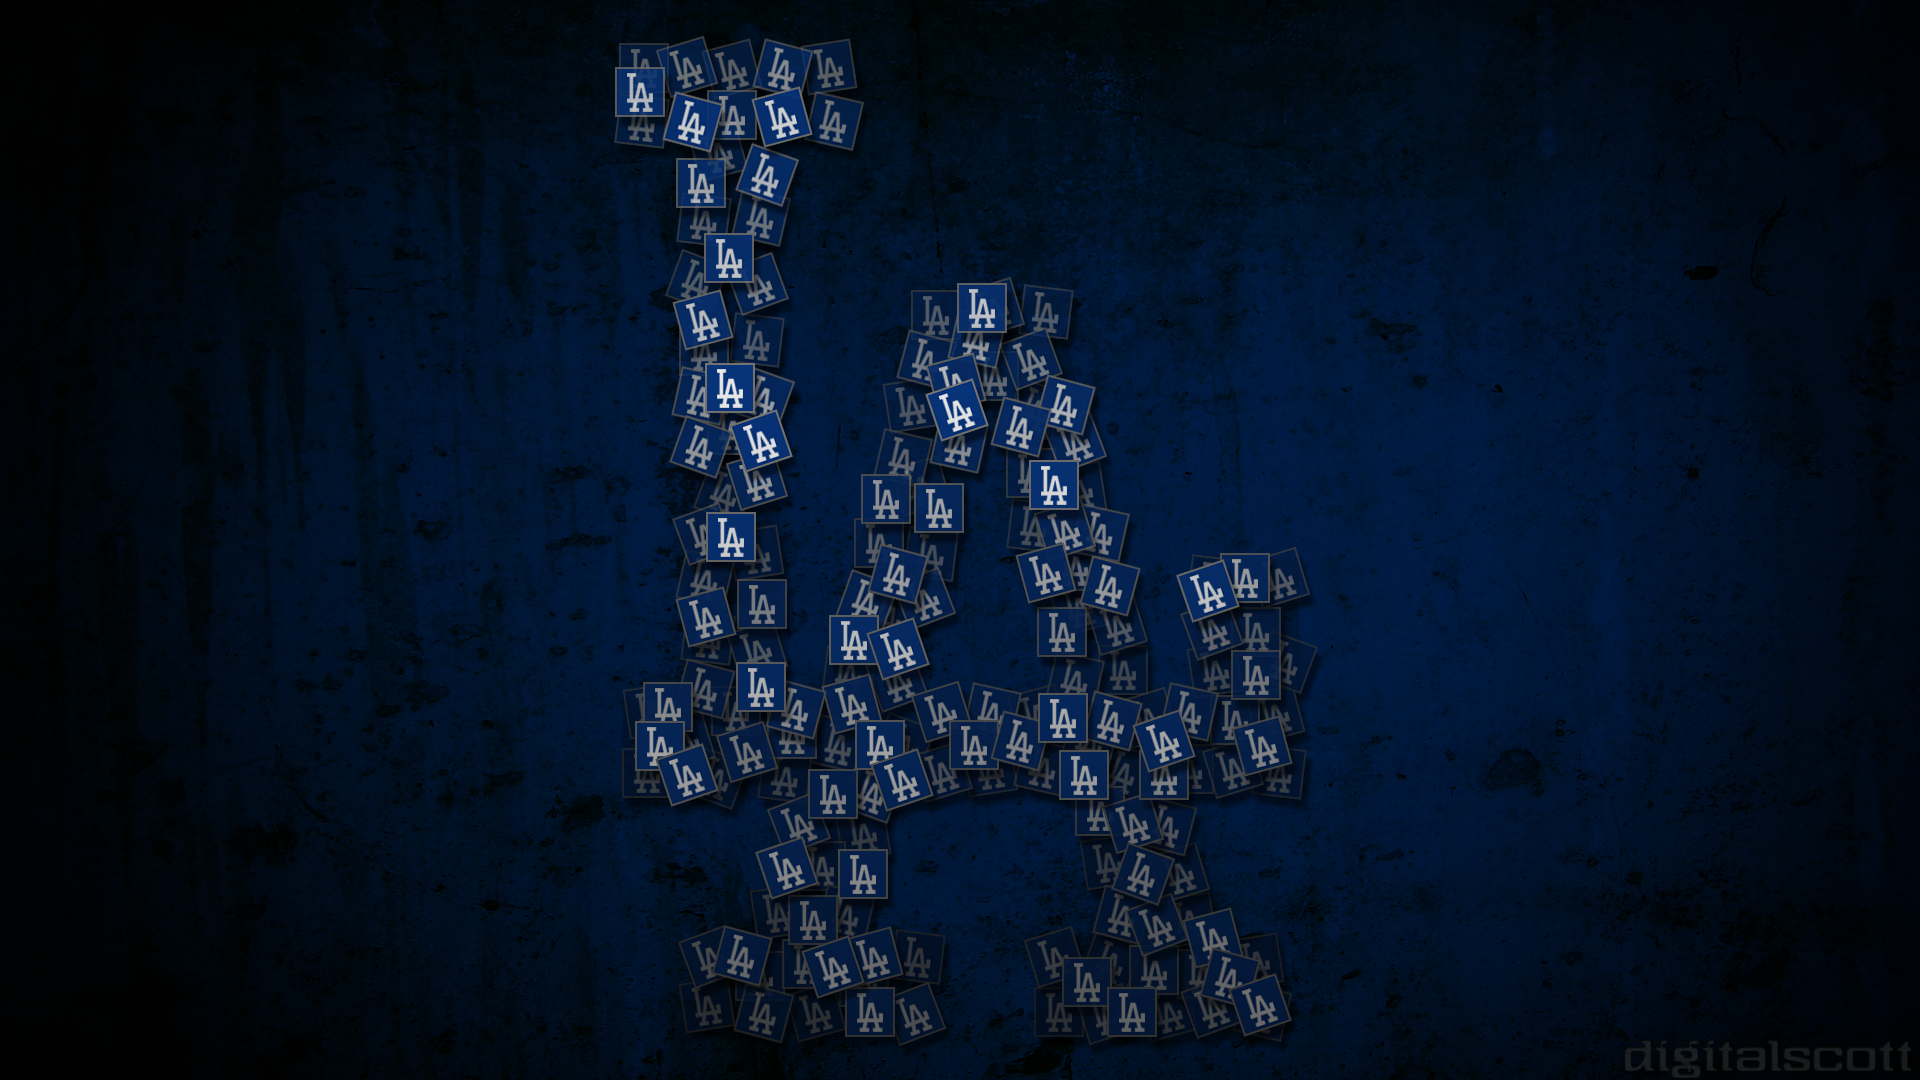 Los Angeles Dodgers Wallpapers Wallpaper